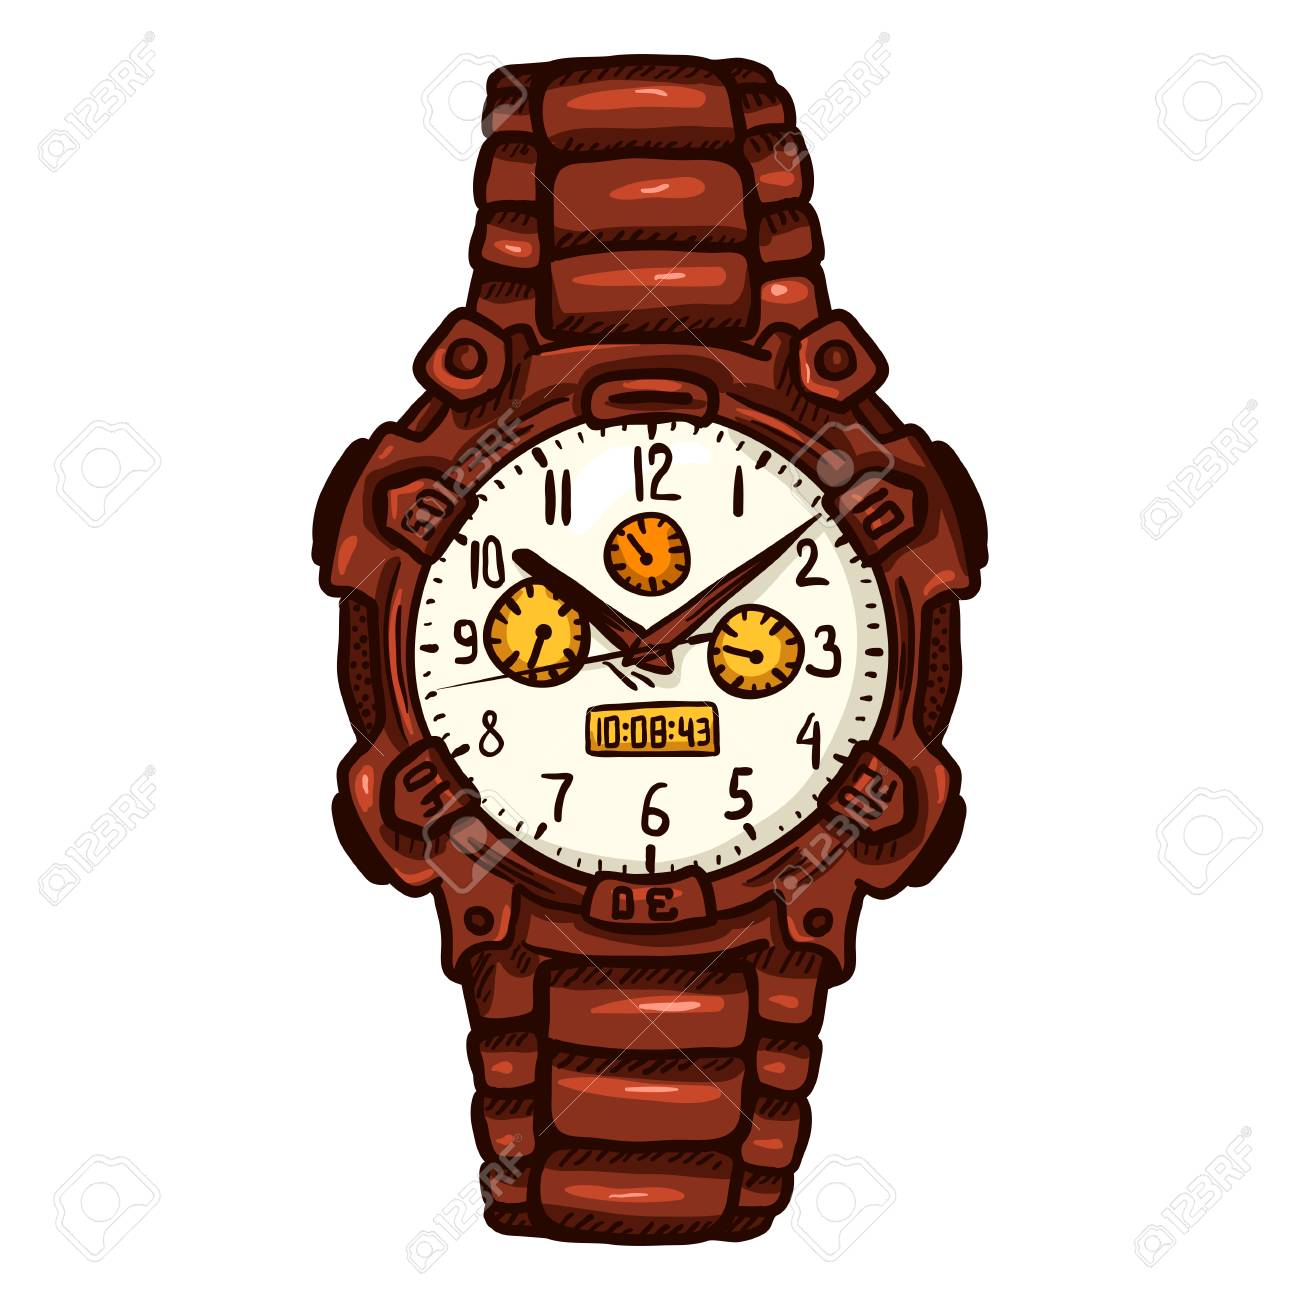 hot sales 6ccc2 2f301 漫画赤モダンなメンズ腕時計